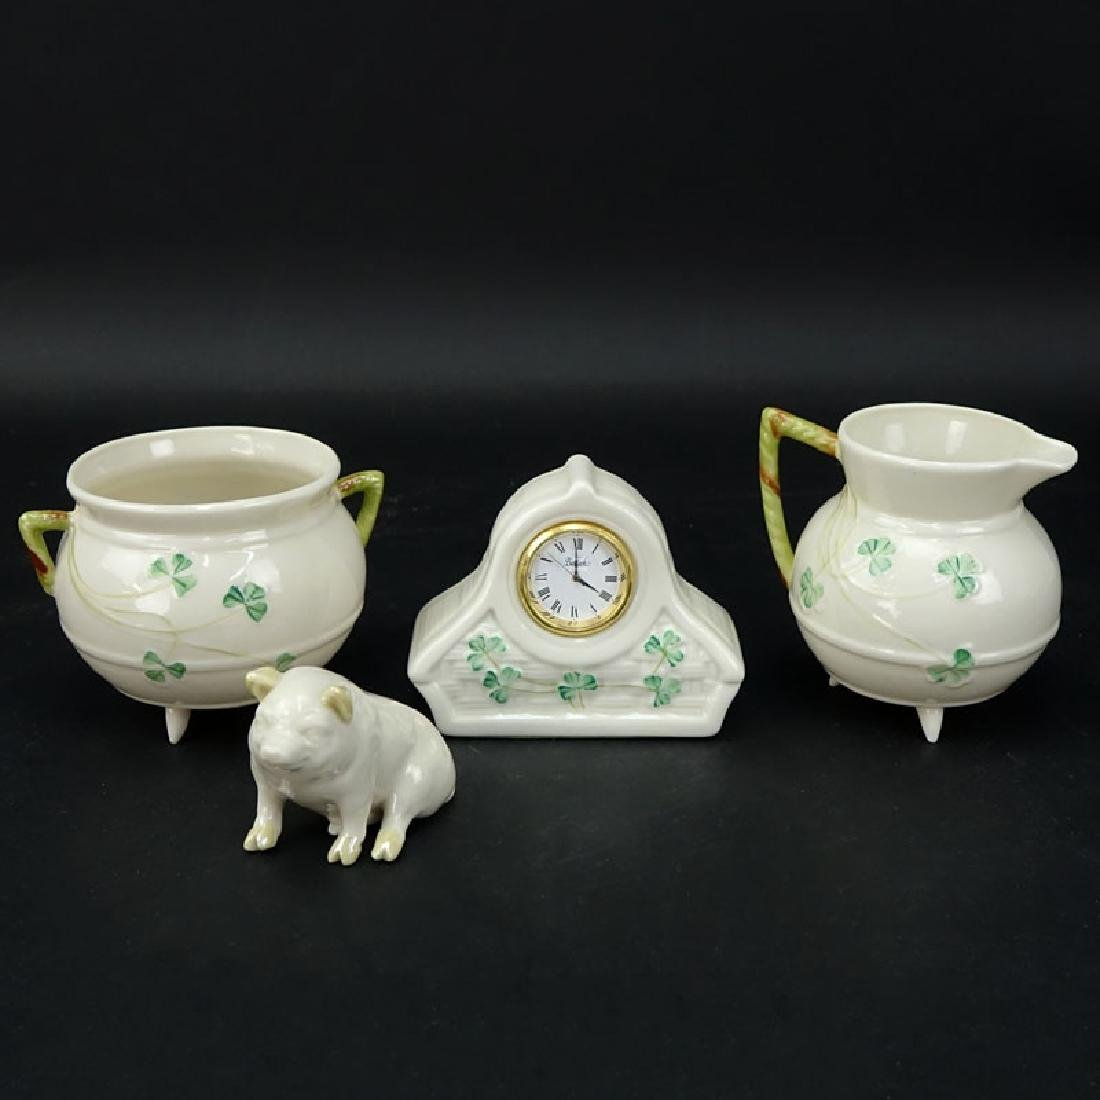 Lot of Three (3) Belleek Porcelain items. No Bowl